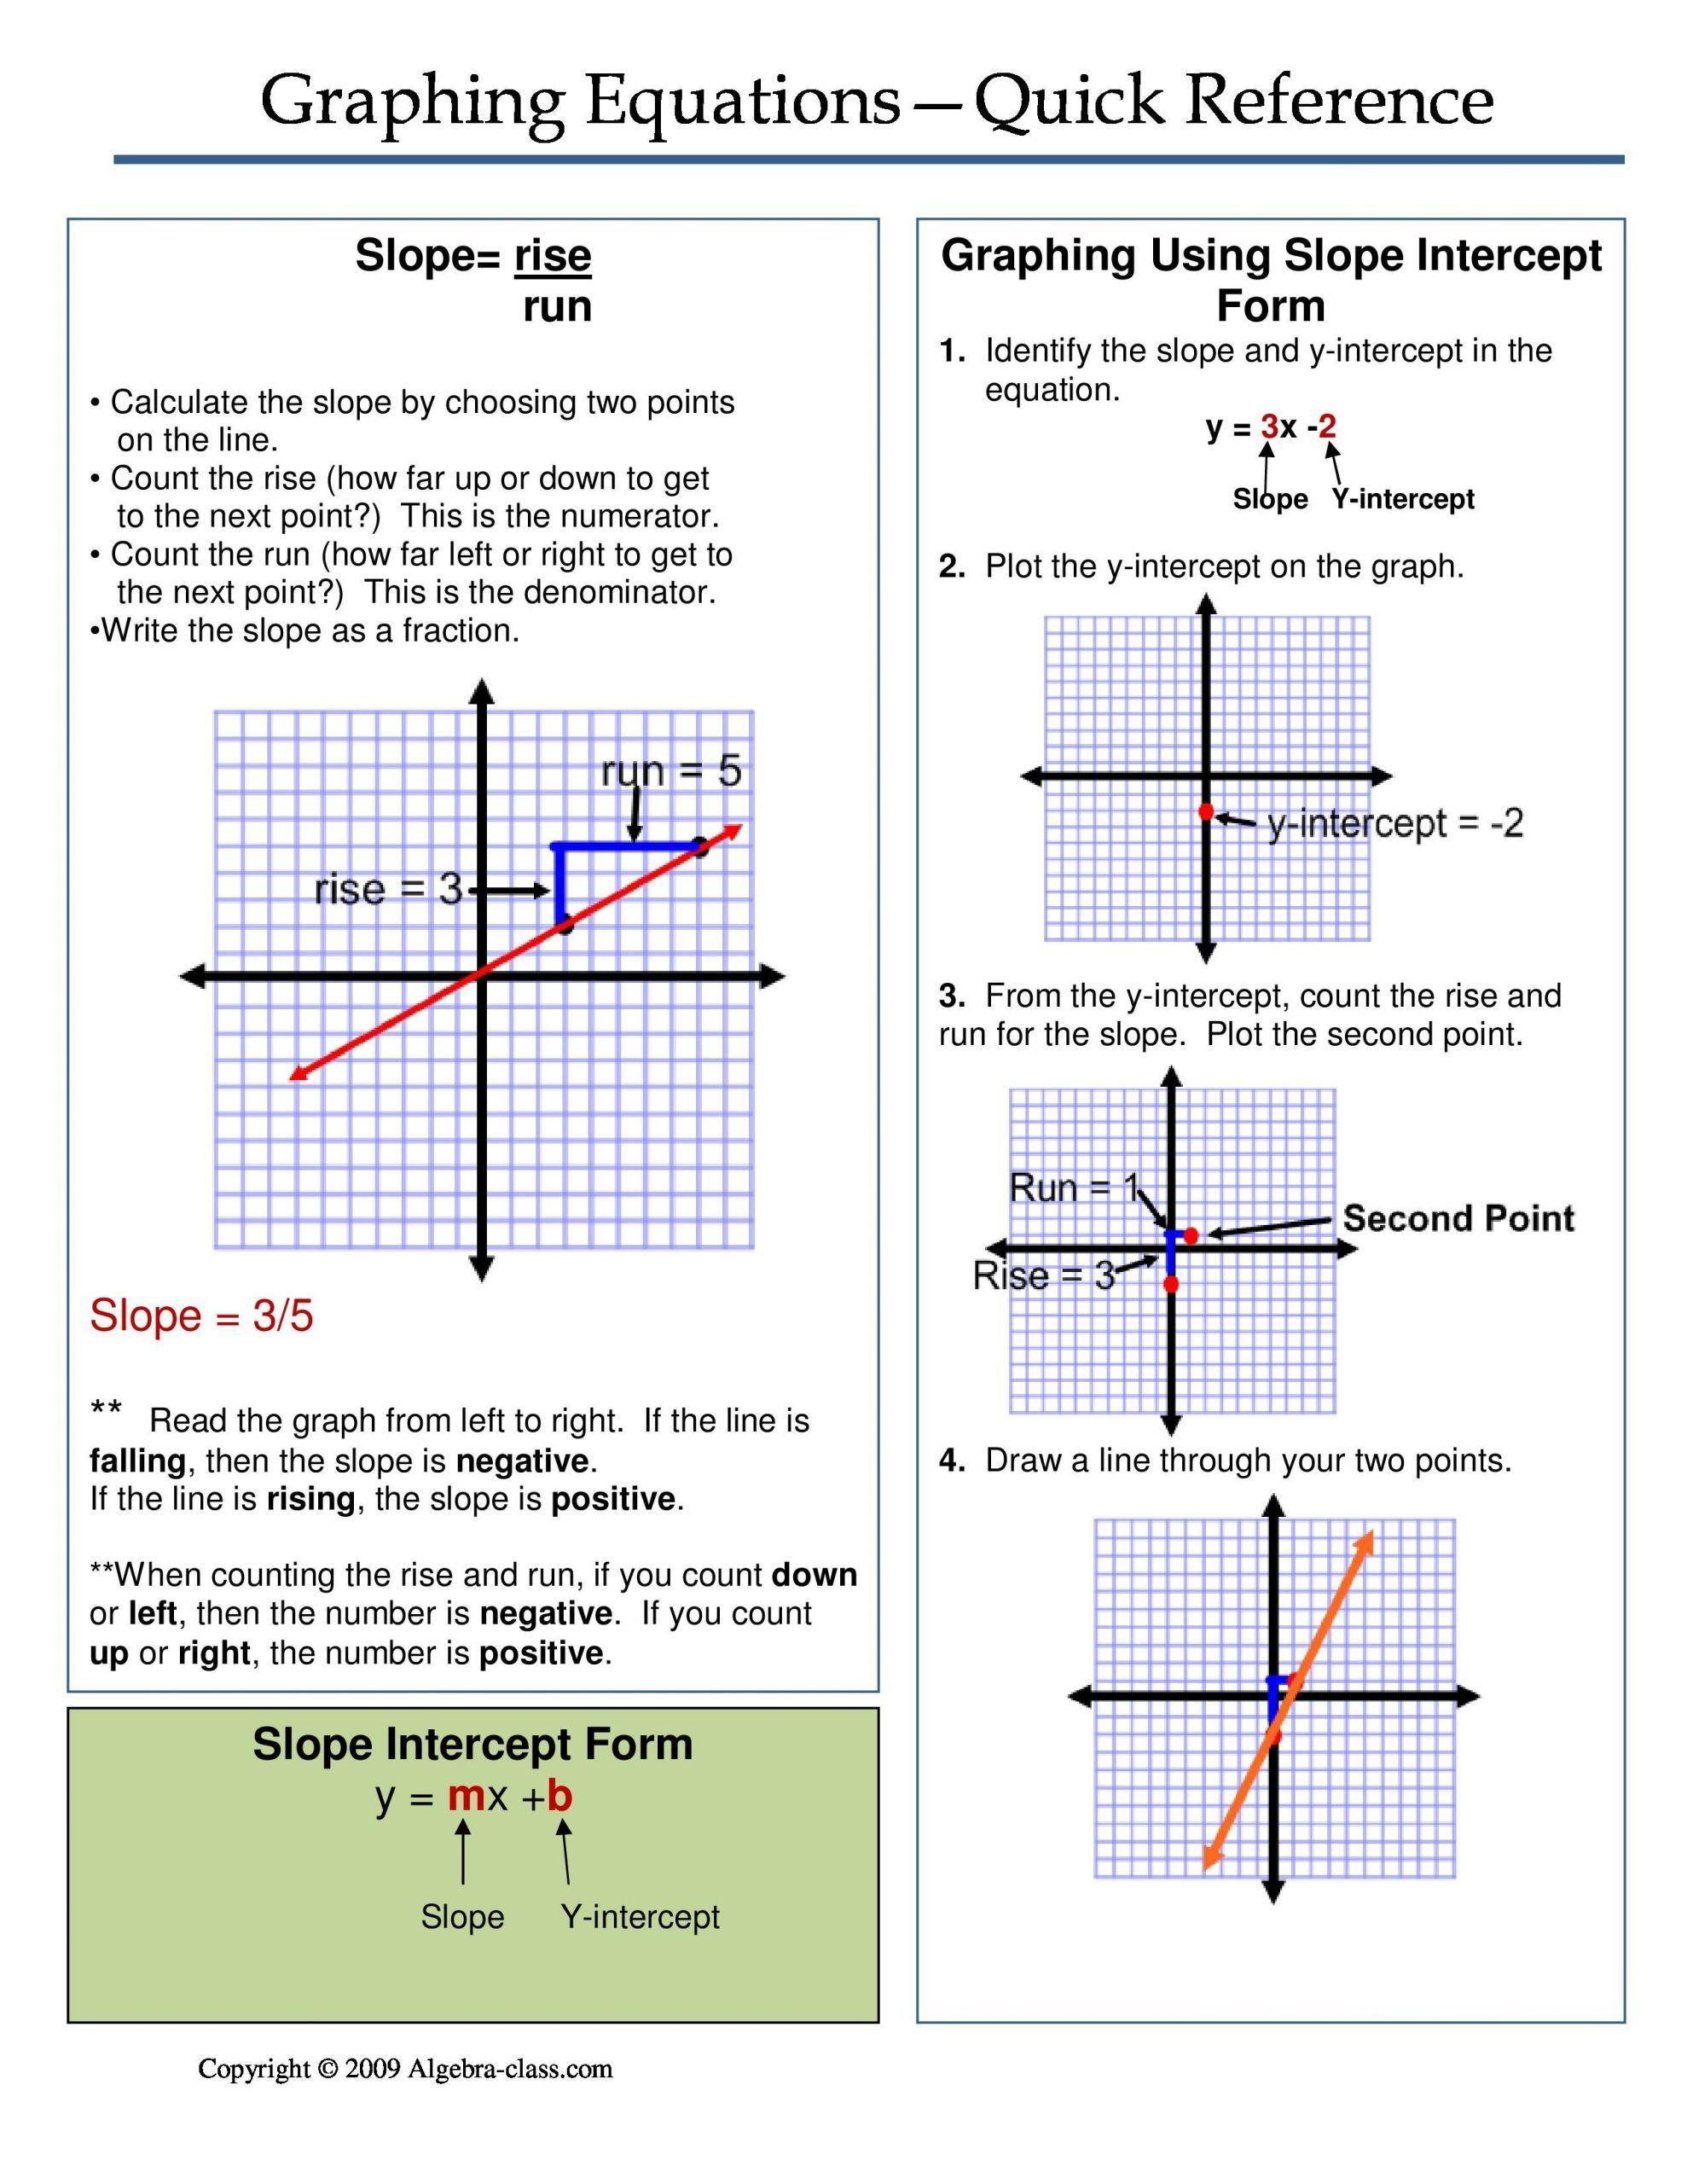 Transformations Of Functions Worksheet Pin On Printable Blank Worksheet Template